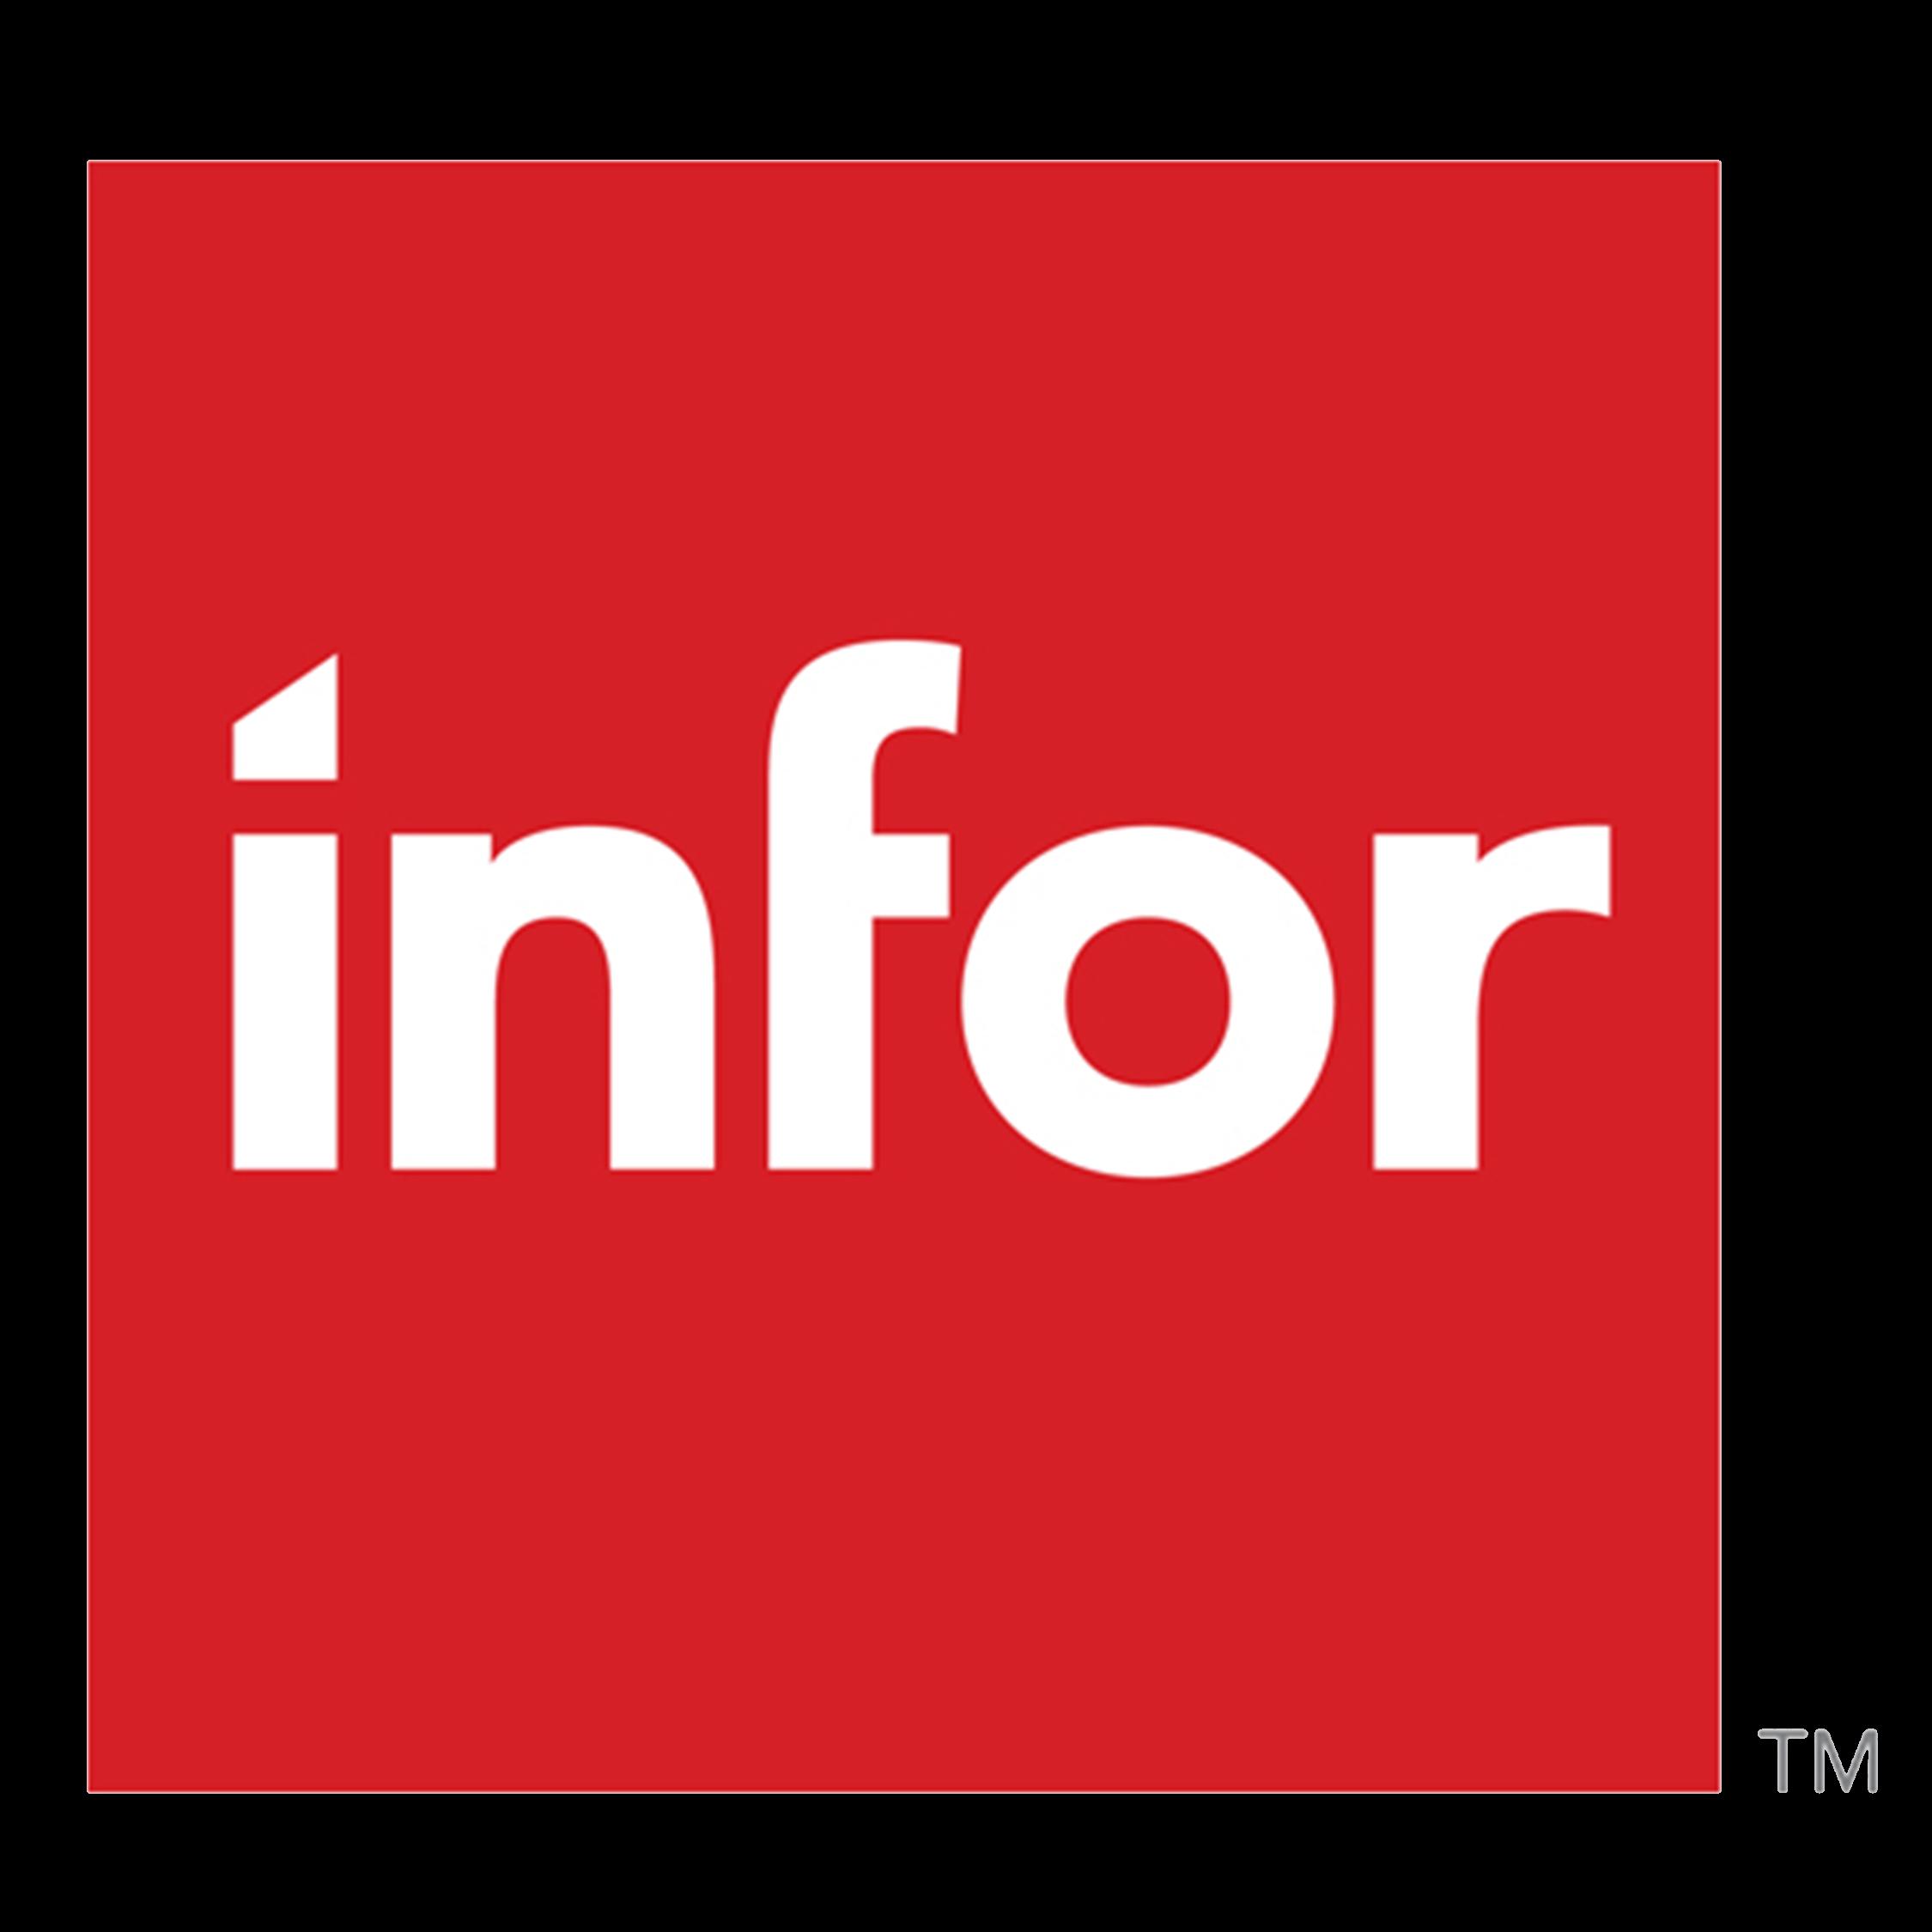 Infor Lawson logo